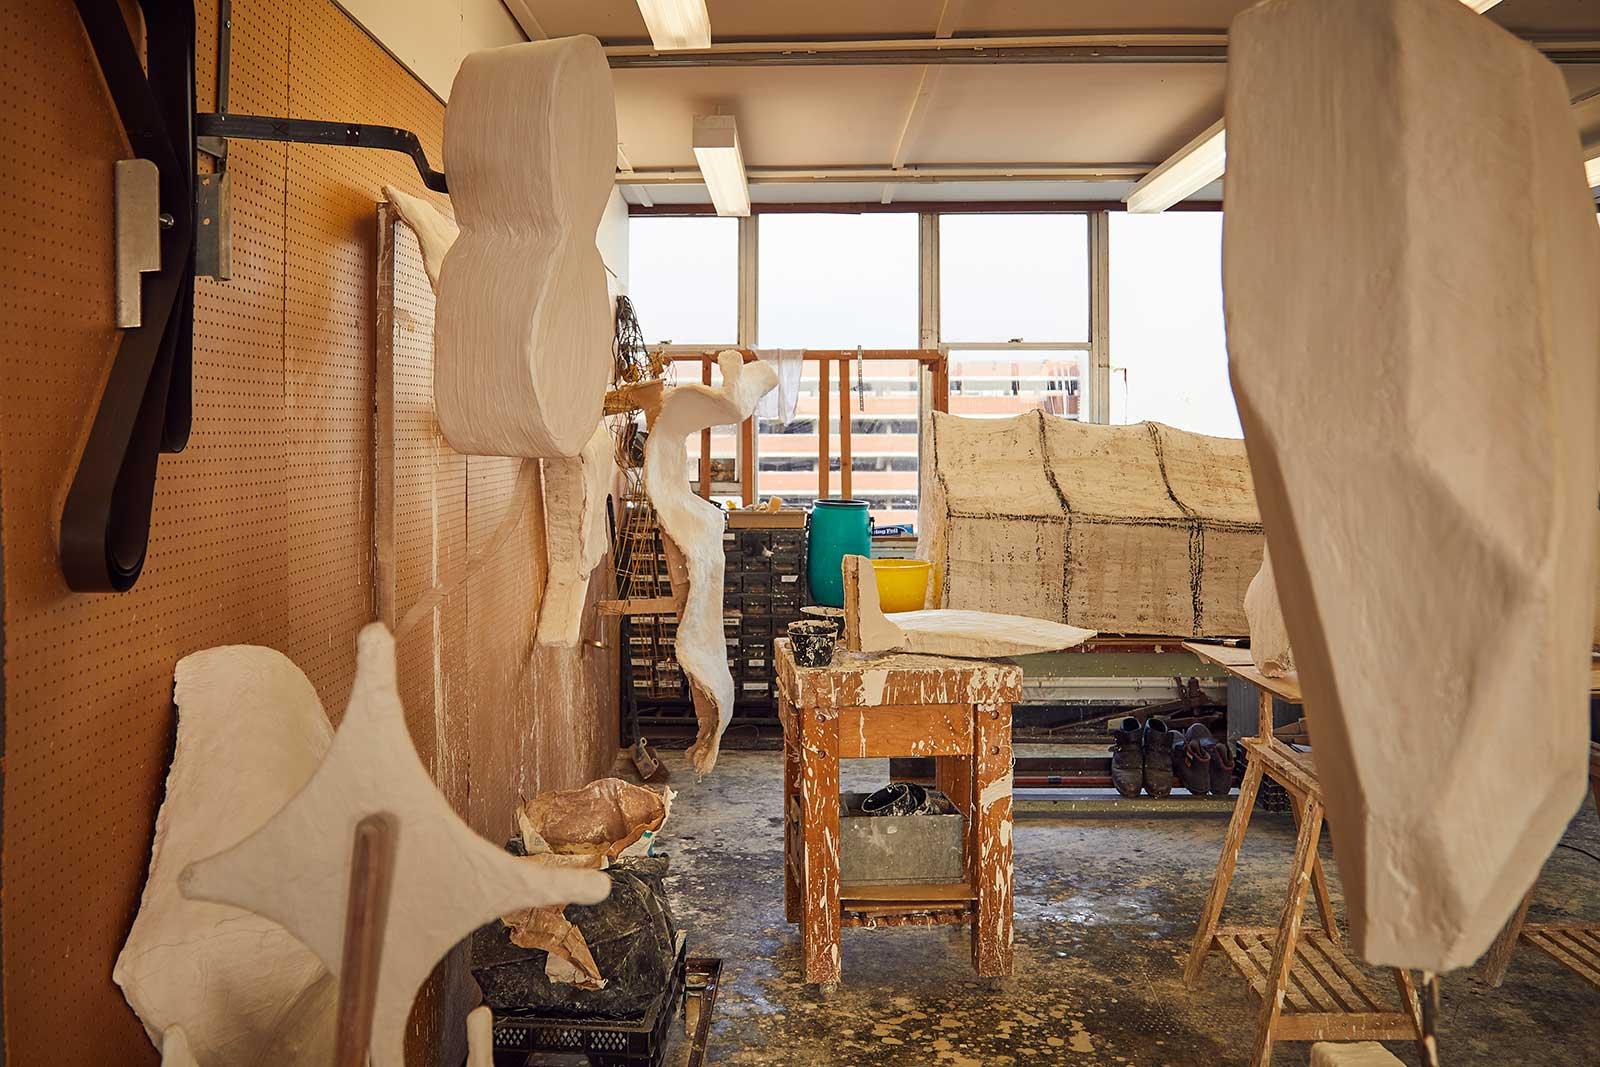 Desmond's studio and work space